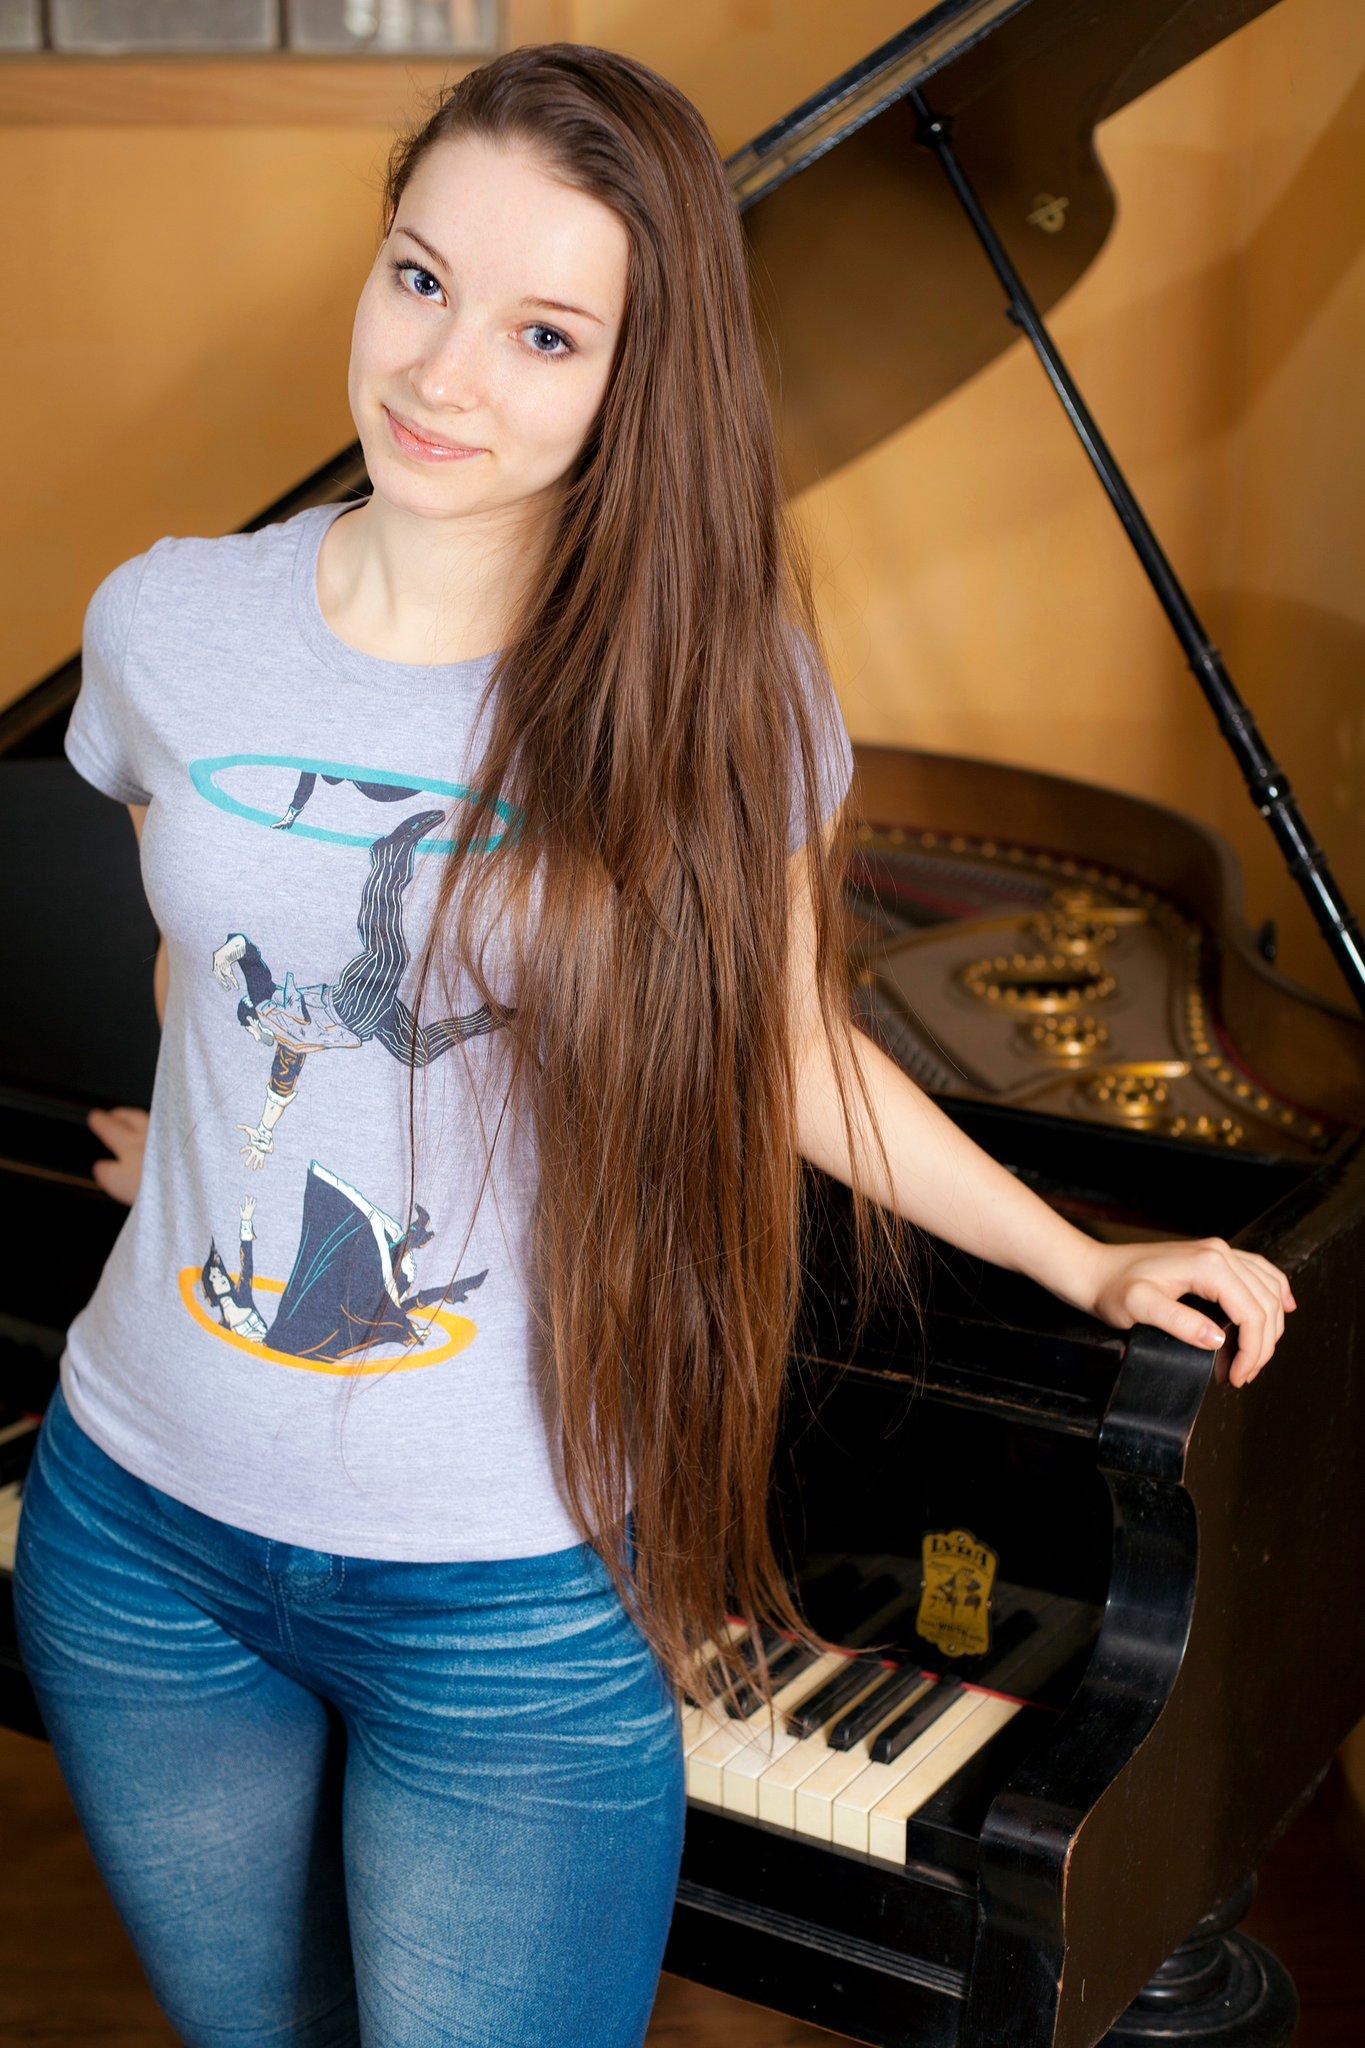 Wallpaper : Enji night, brunette, long hair, looking at viewer, T shirt, jeans, piano, women ...